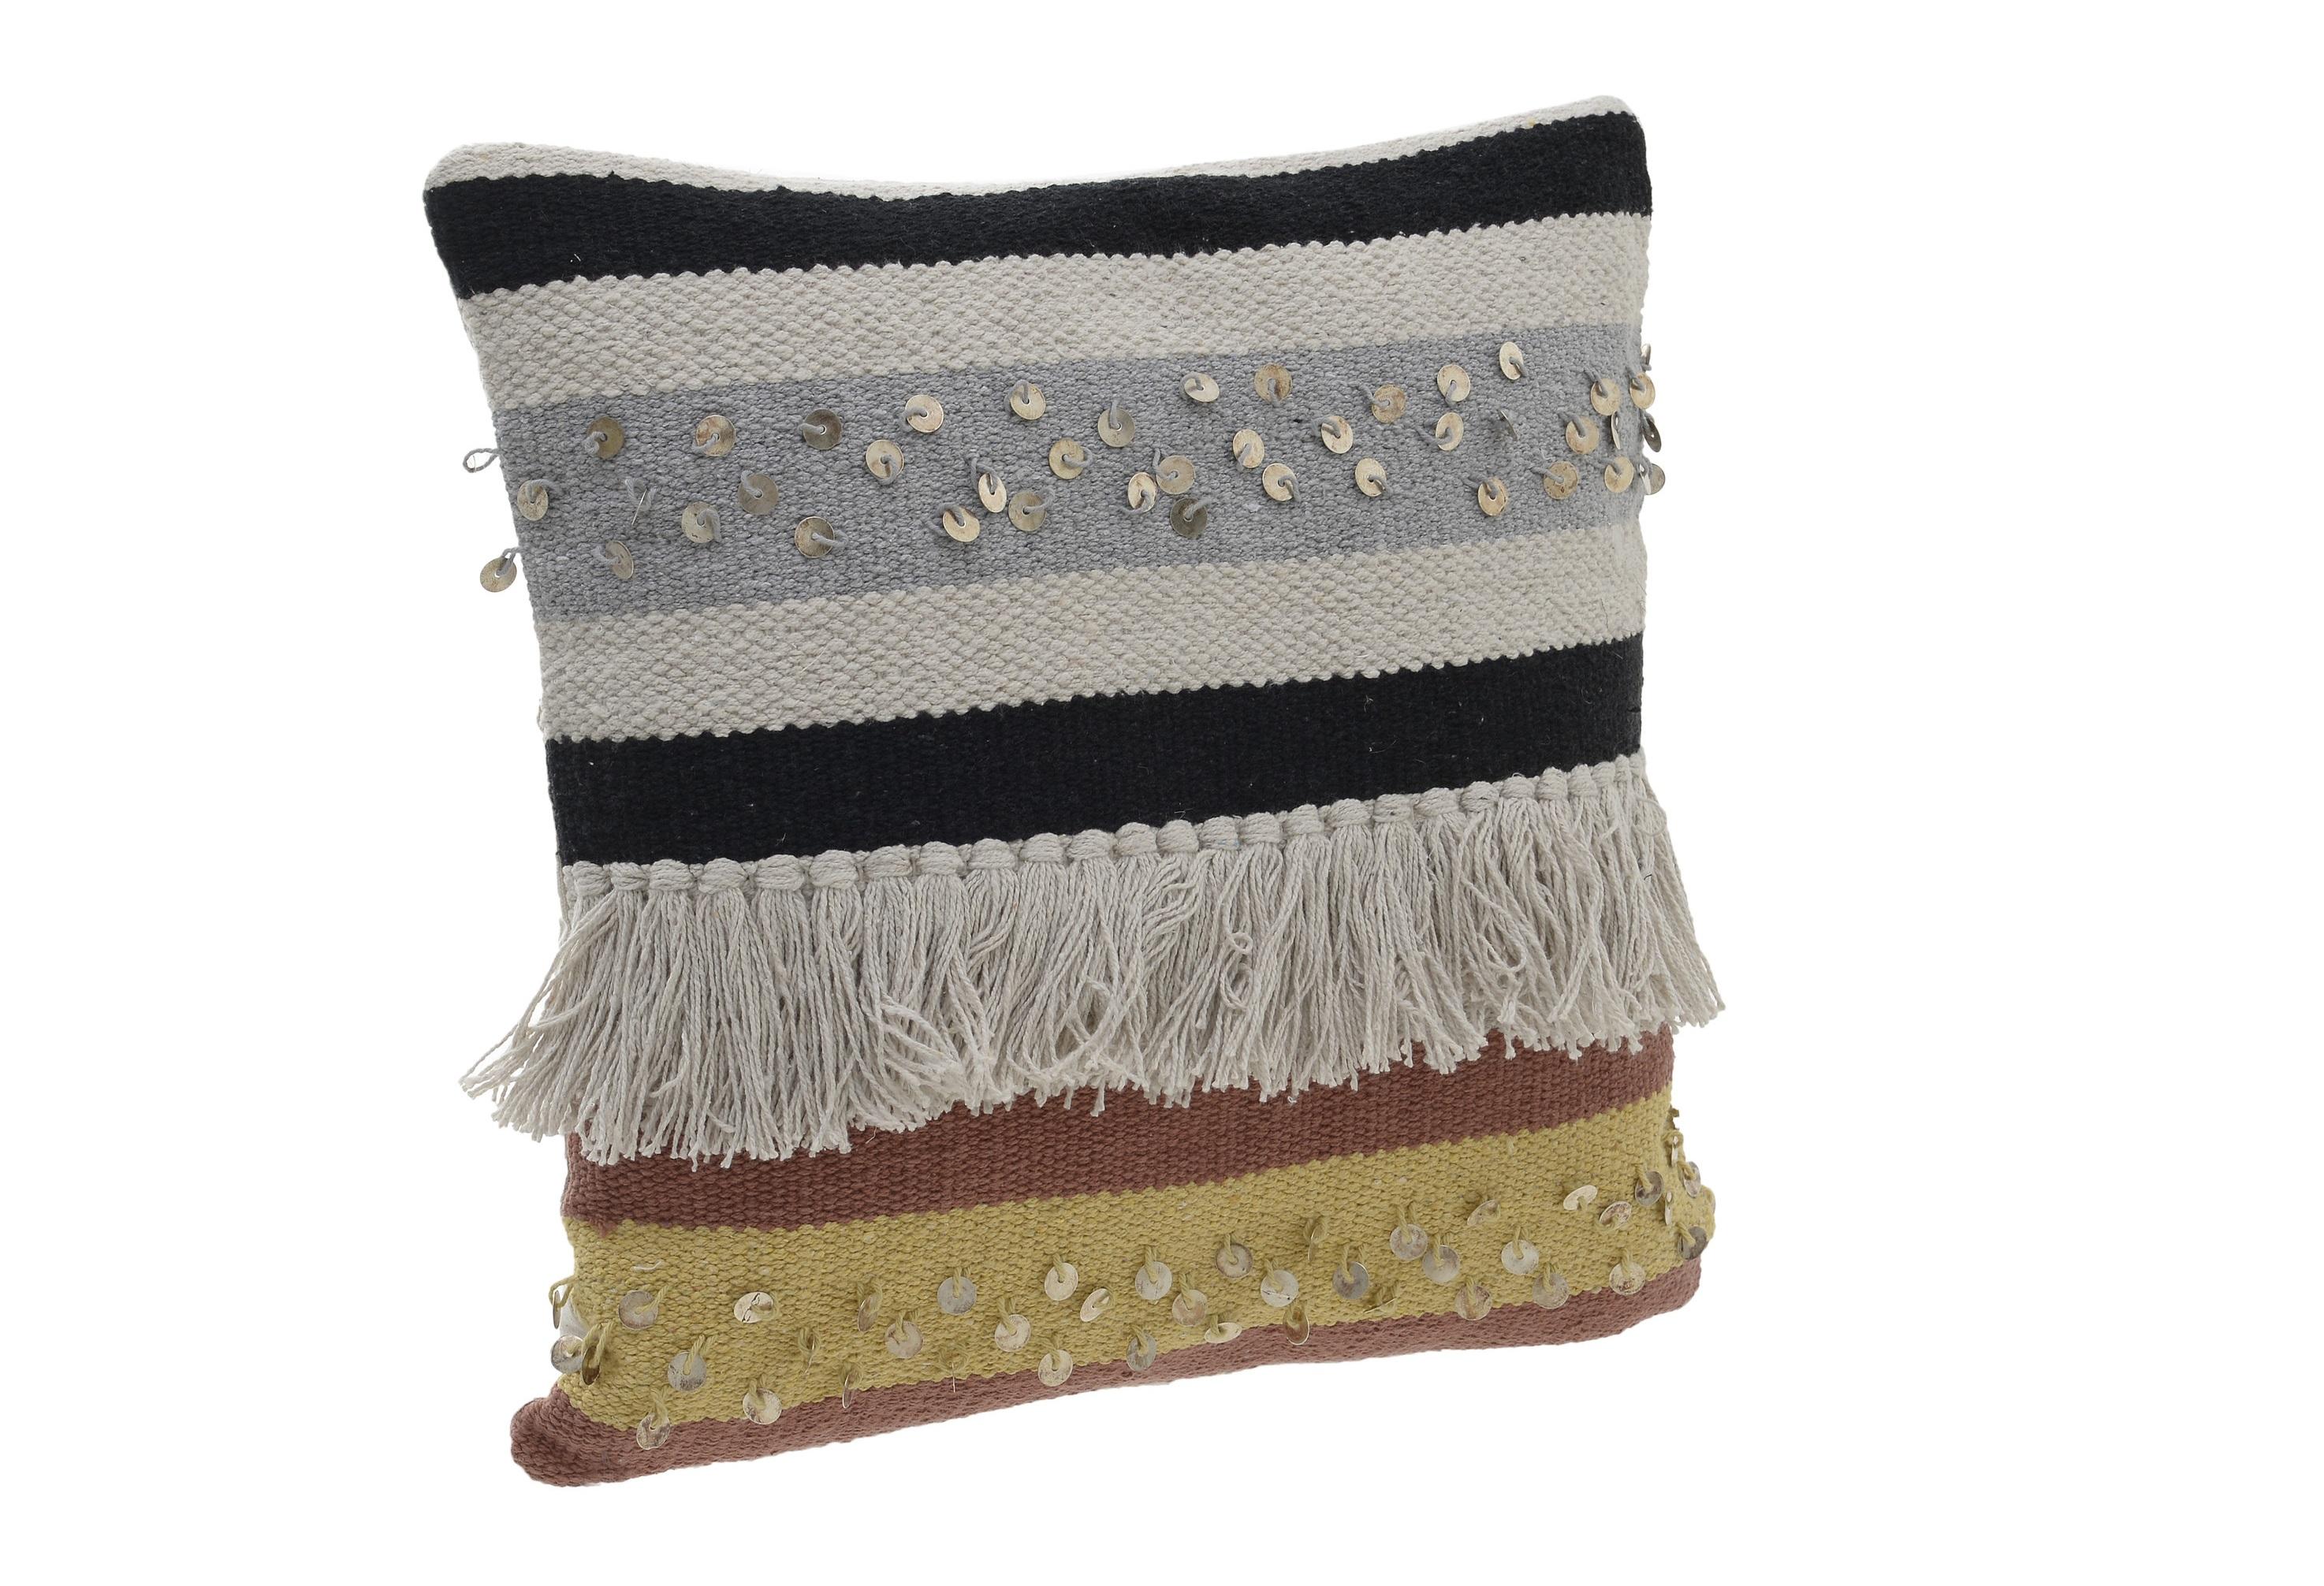 Подушка LynnКвадратные подушки и наволочки<br><br><br>Material: Текстиль<br>Ширина см: 45<br>Высота см: 45<br>Глубина см: 7